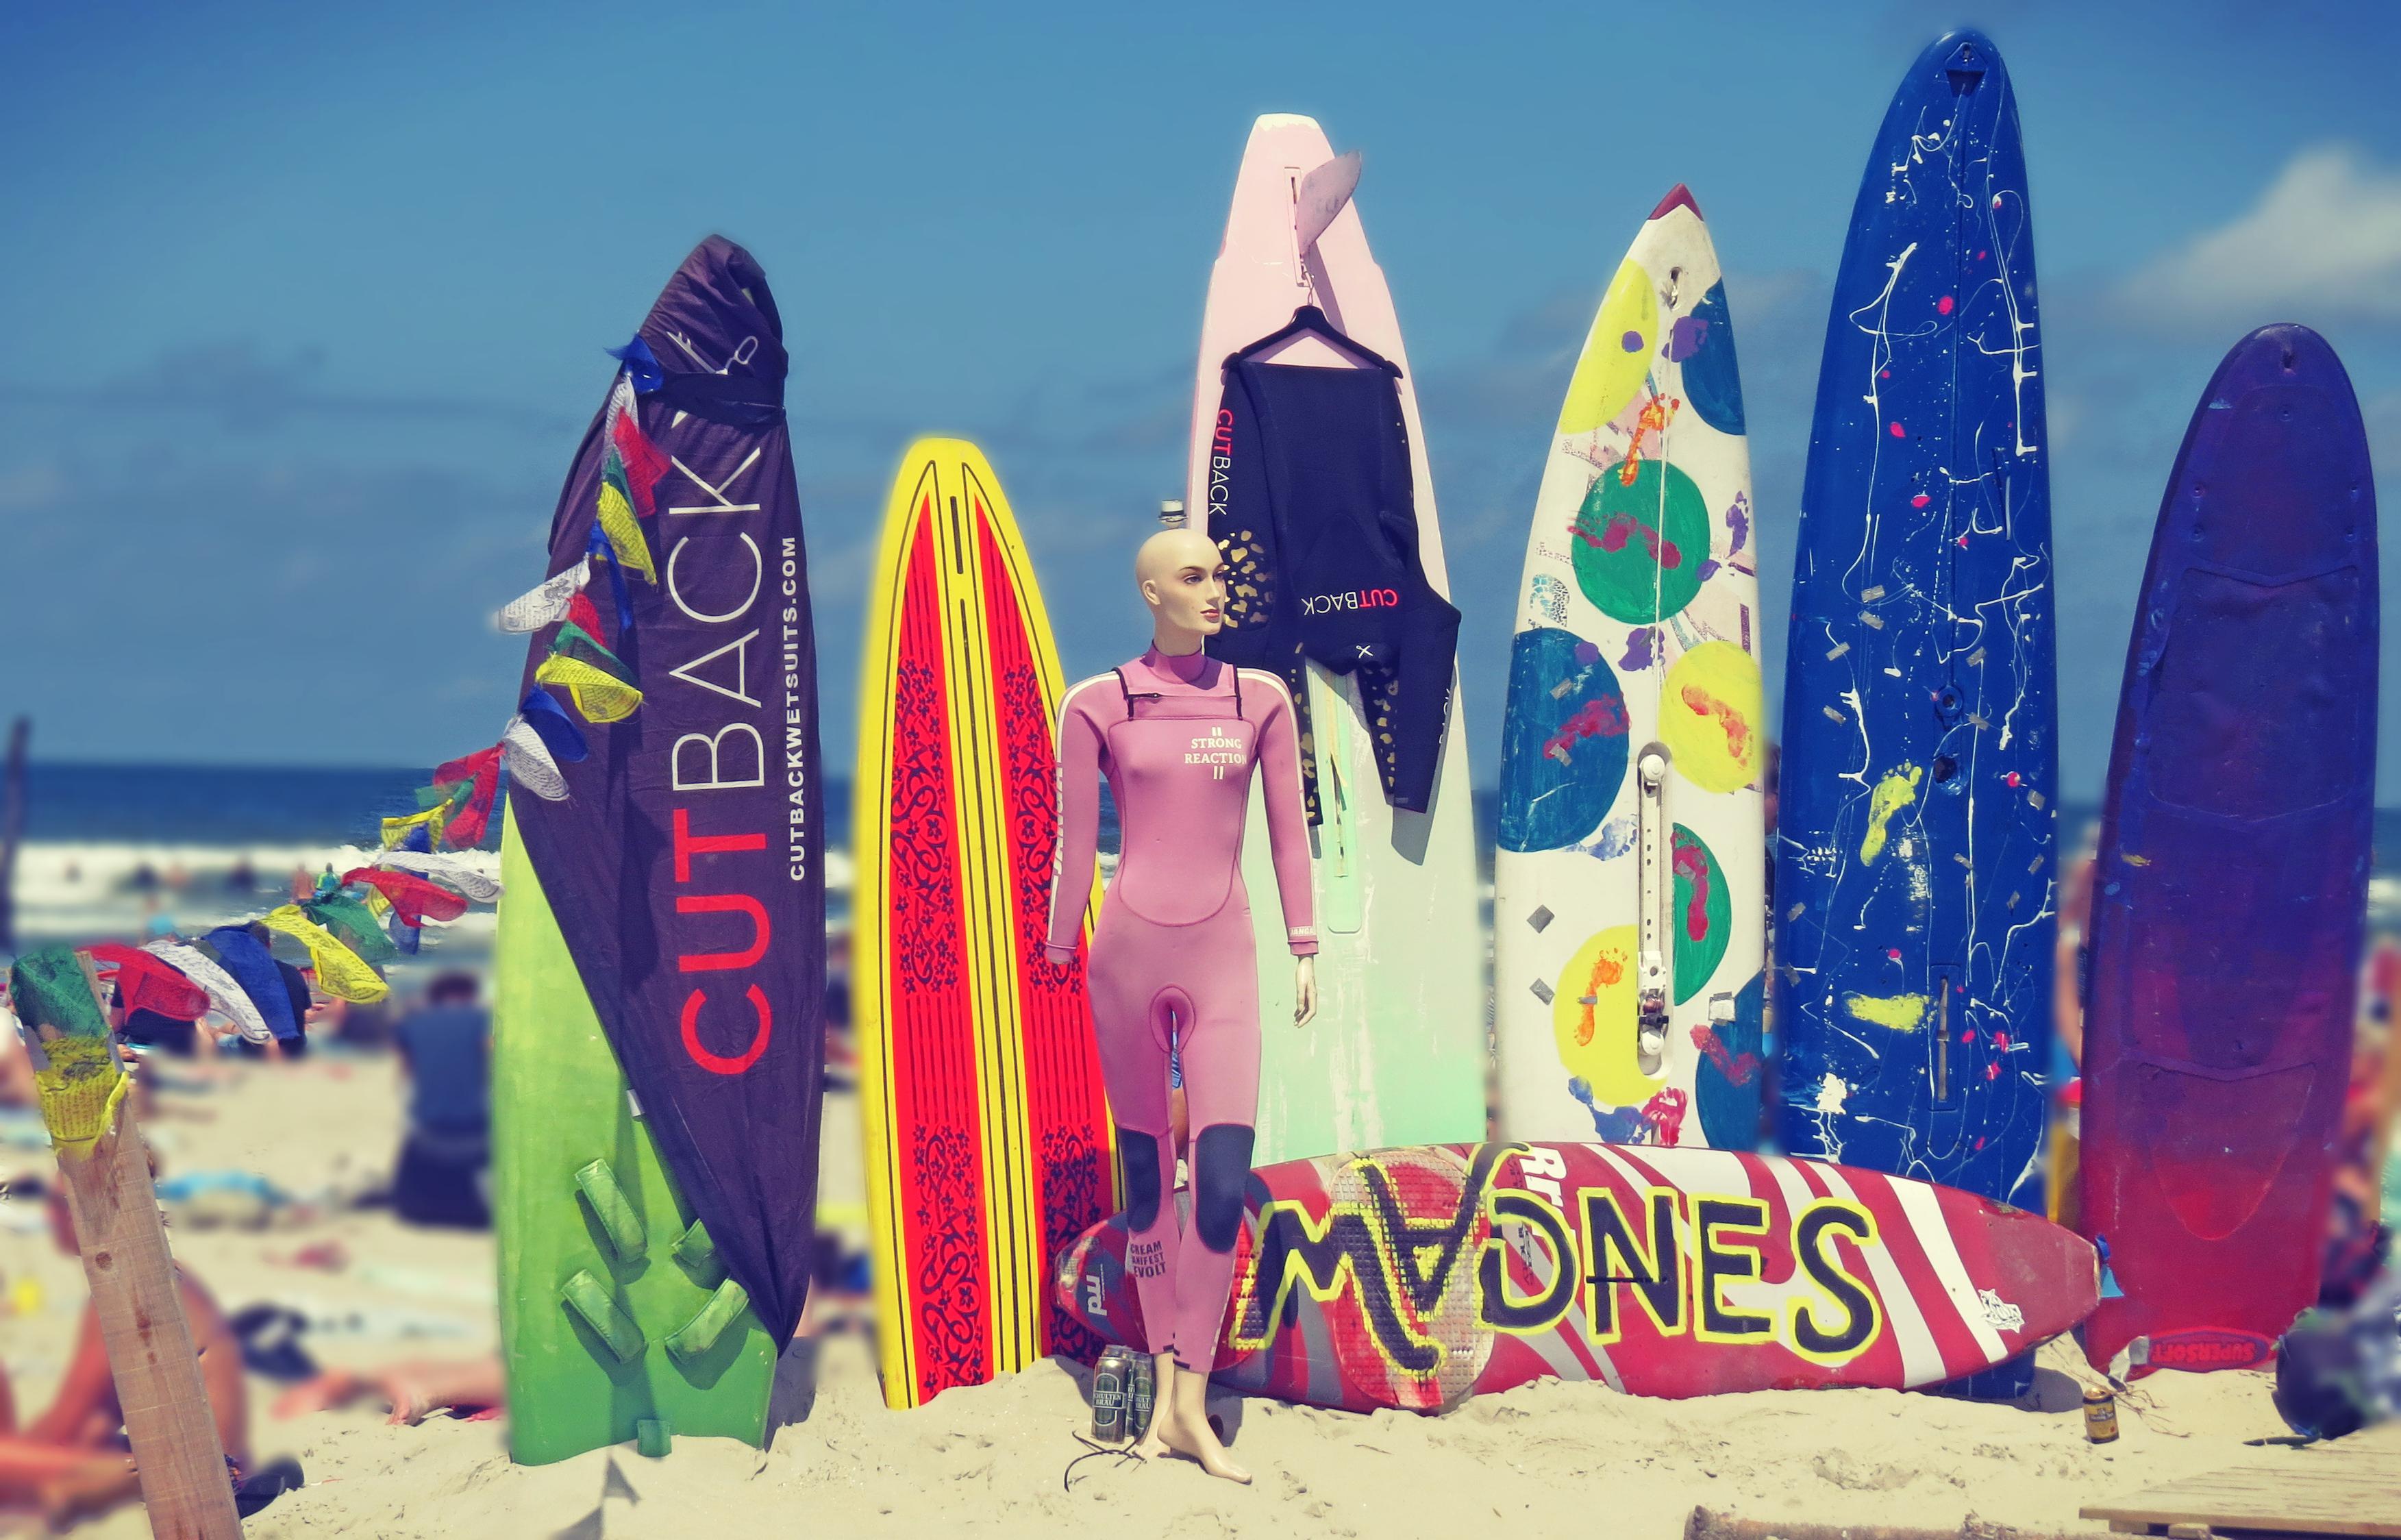 podium, surfplanken, MadNes Festival 2018 - Fotocredits Djuna Vaesen (ArtiestenNieuws)